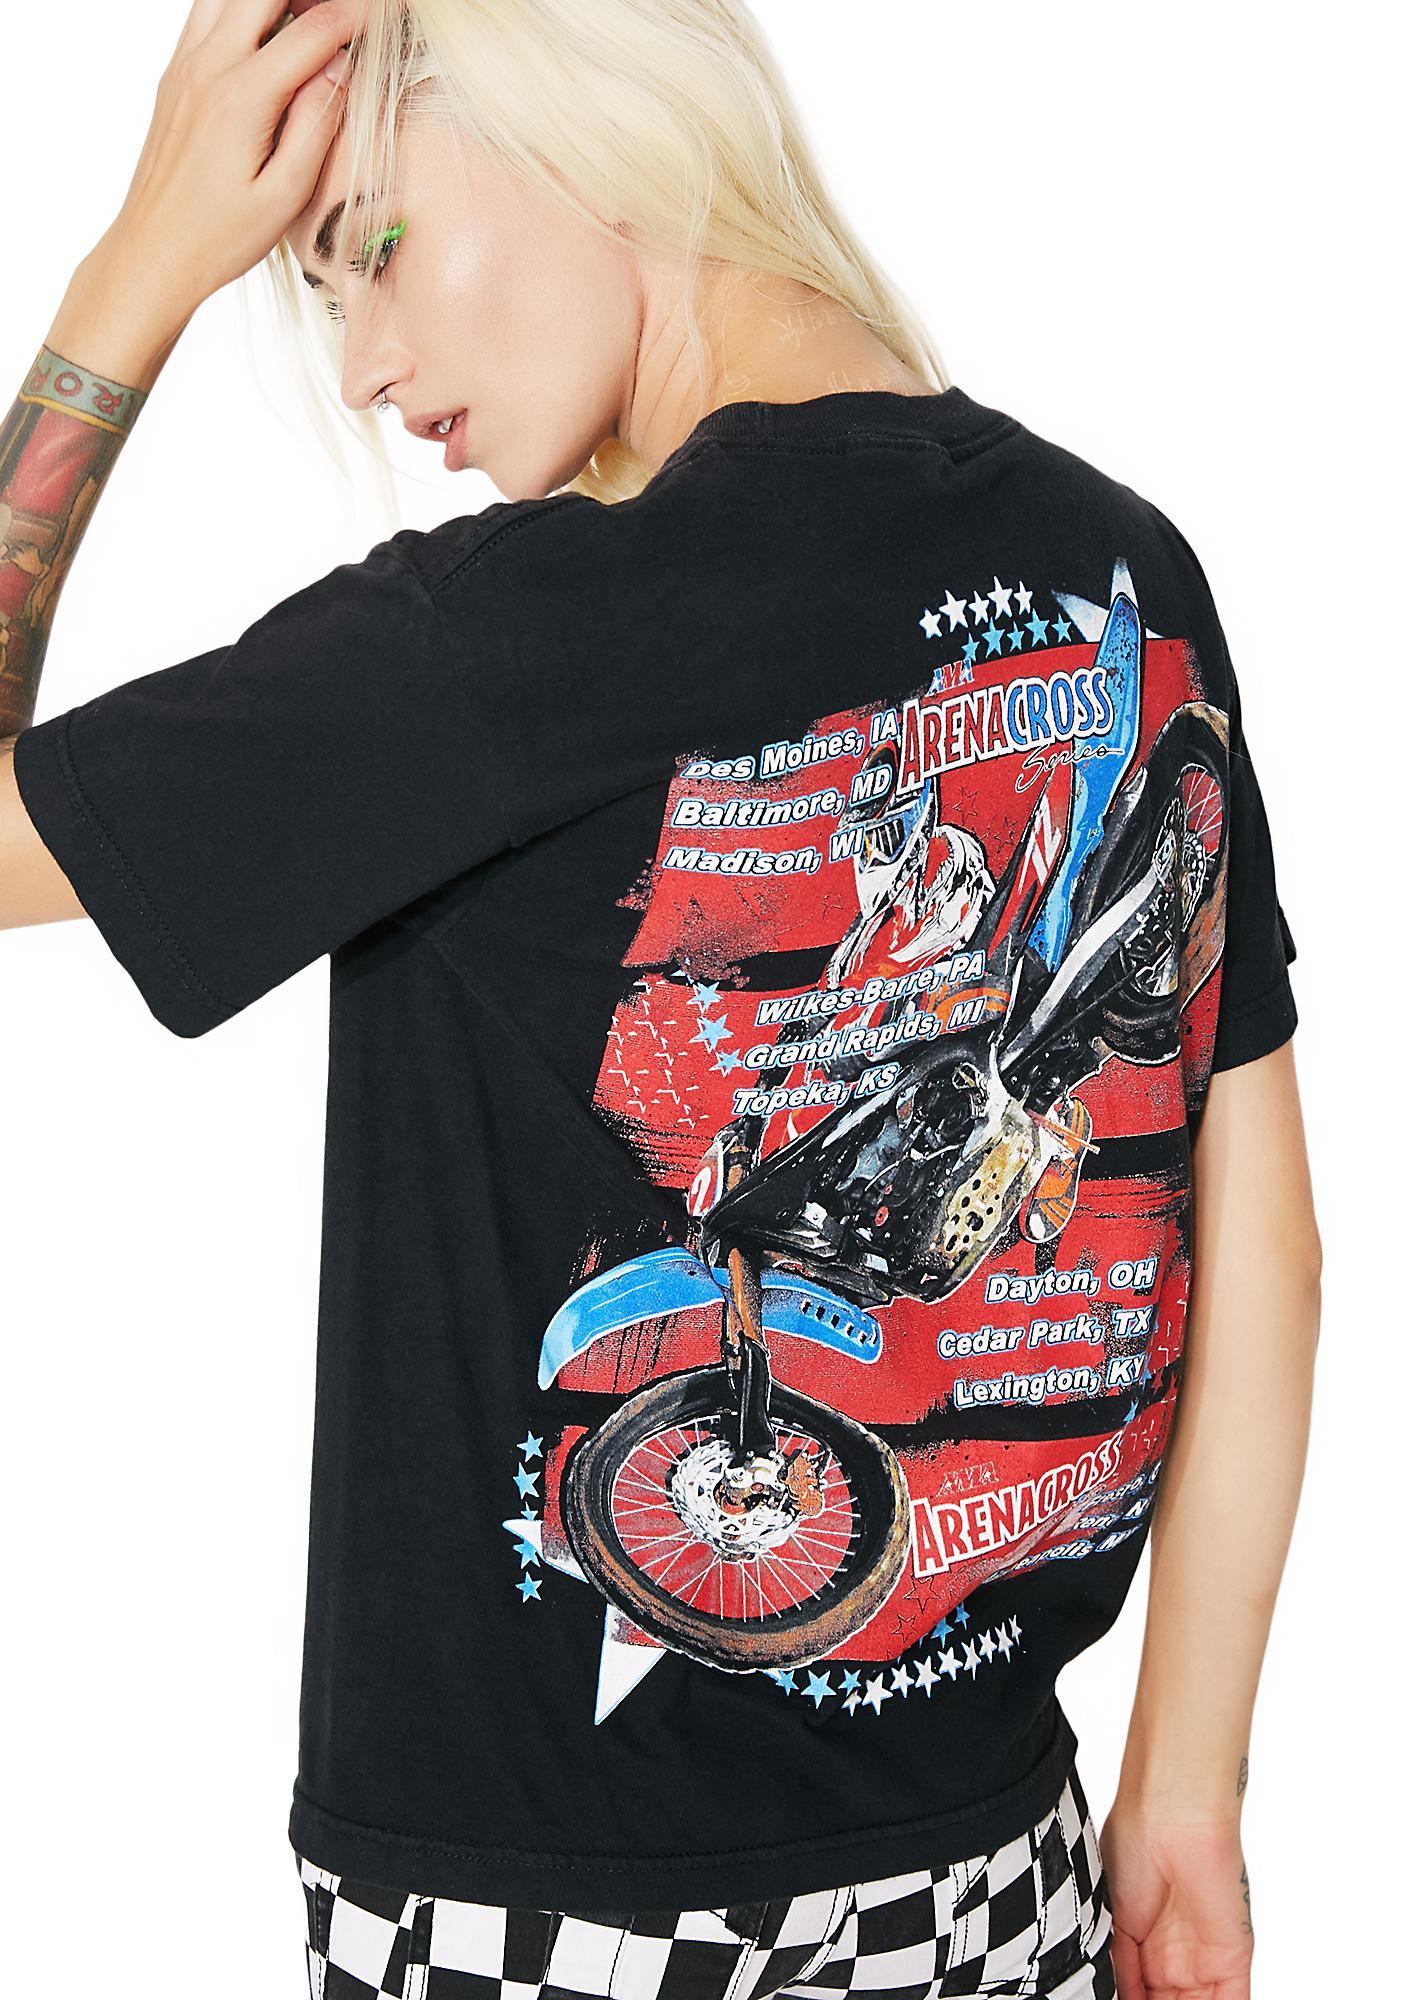 Vintage Arena Cross Moto Tee